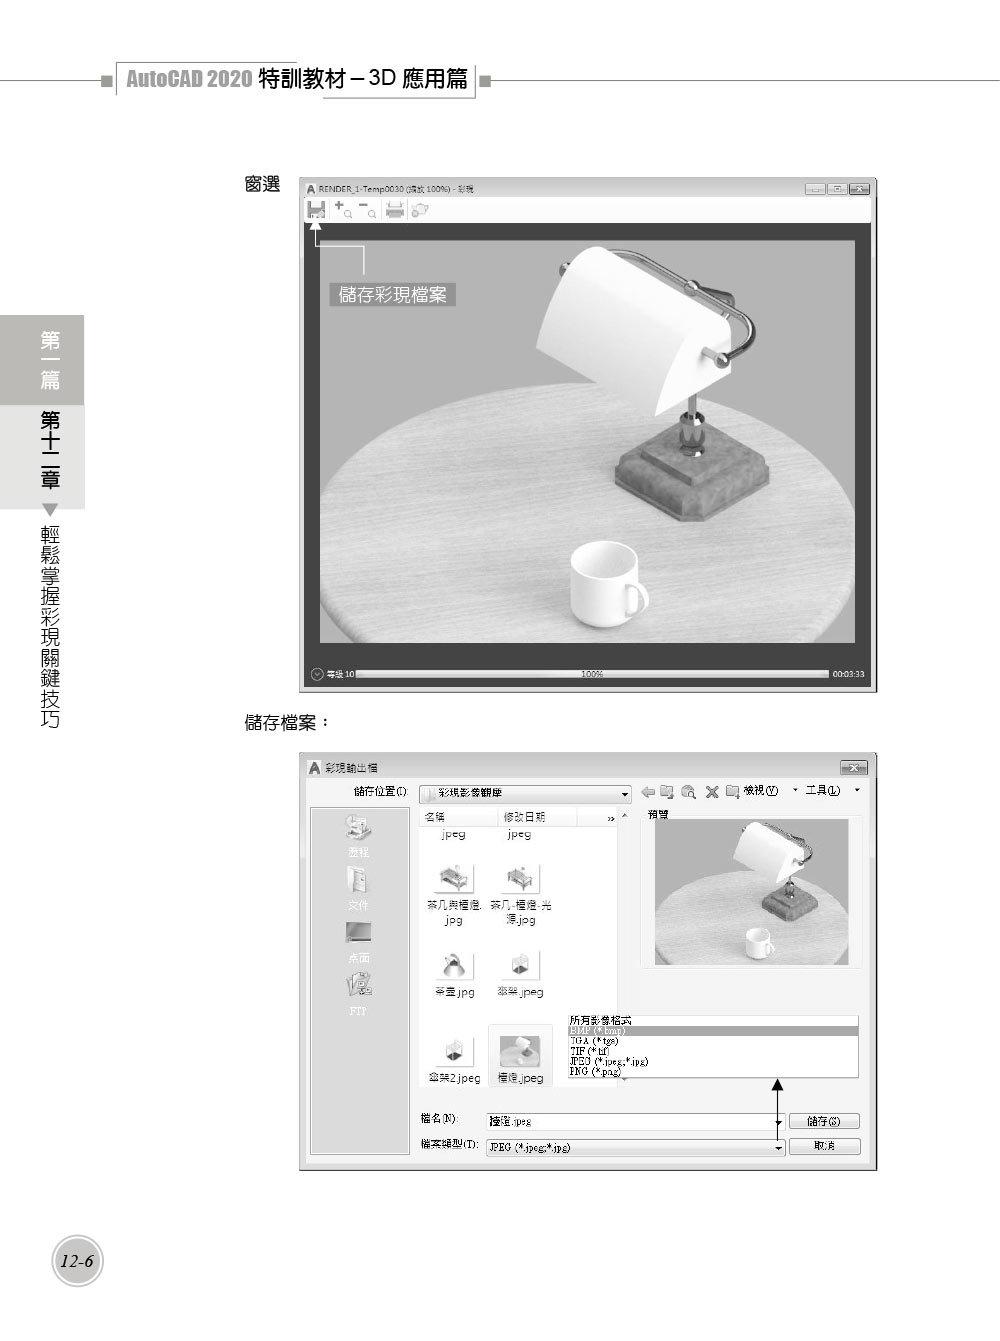 TQC+ AutoCAD 2020 特訓教材 -- 3D應用篇 (隨書附贈23個精彩3D動態教學檔)-preview-6